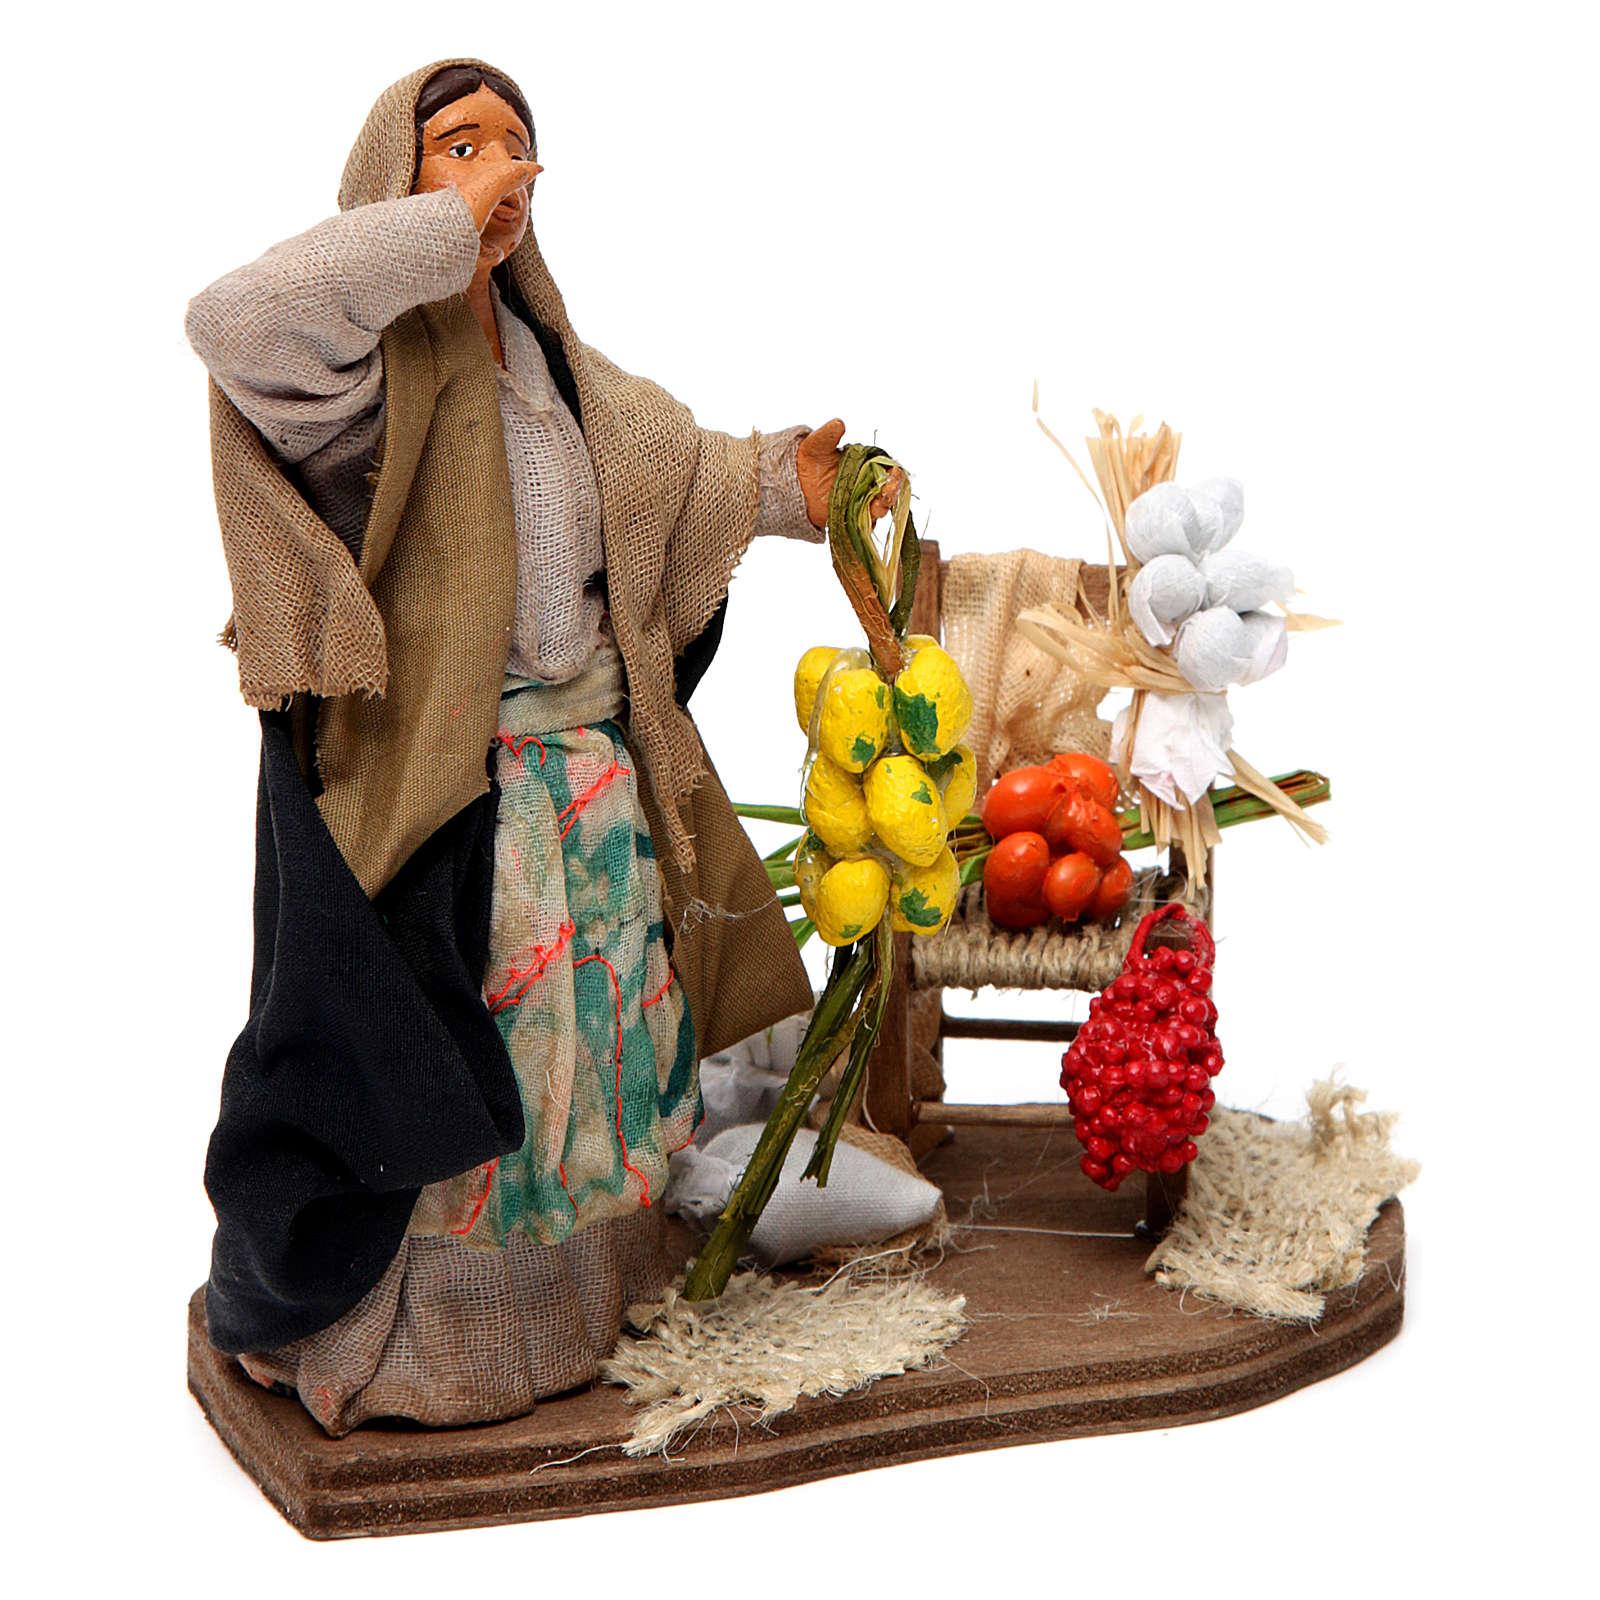 Fruit and Vegetable Vendor for Neapolitan nativity 12 cm 4